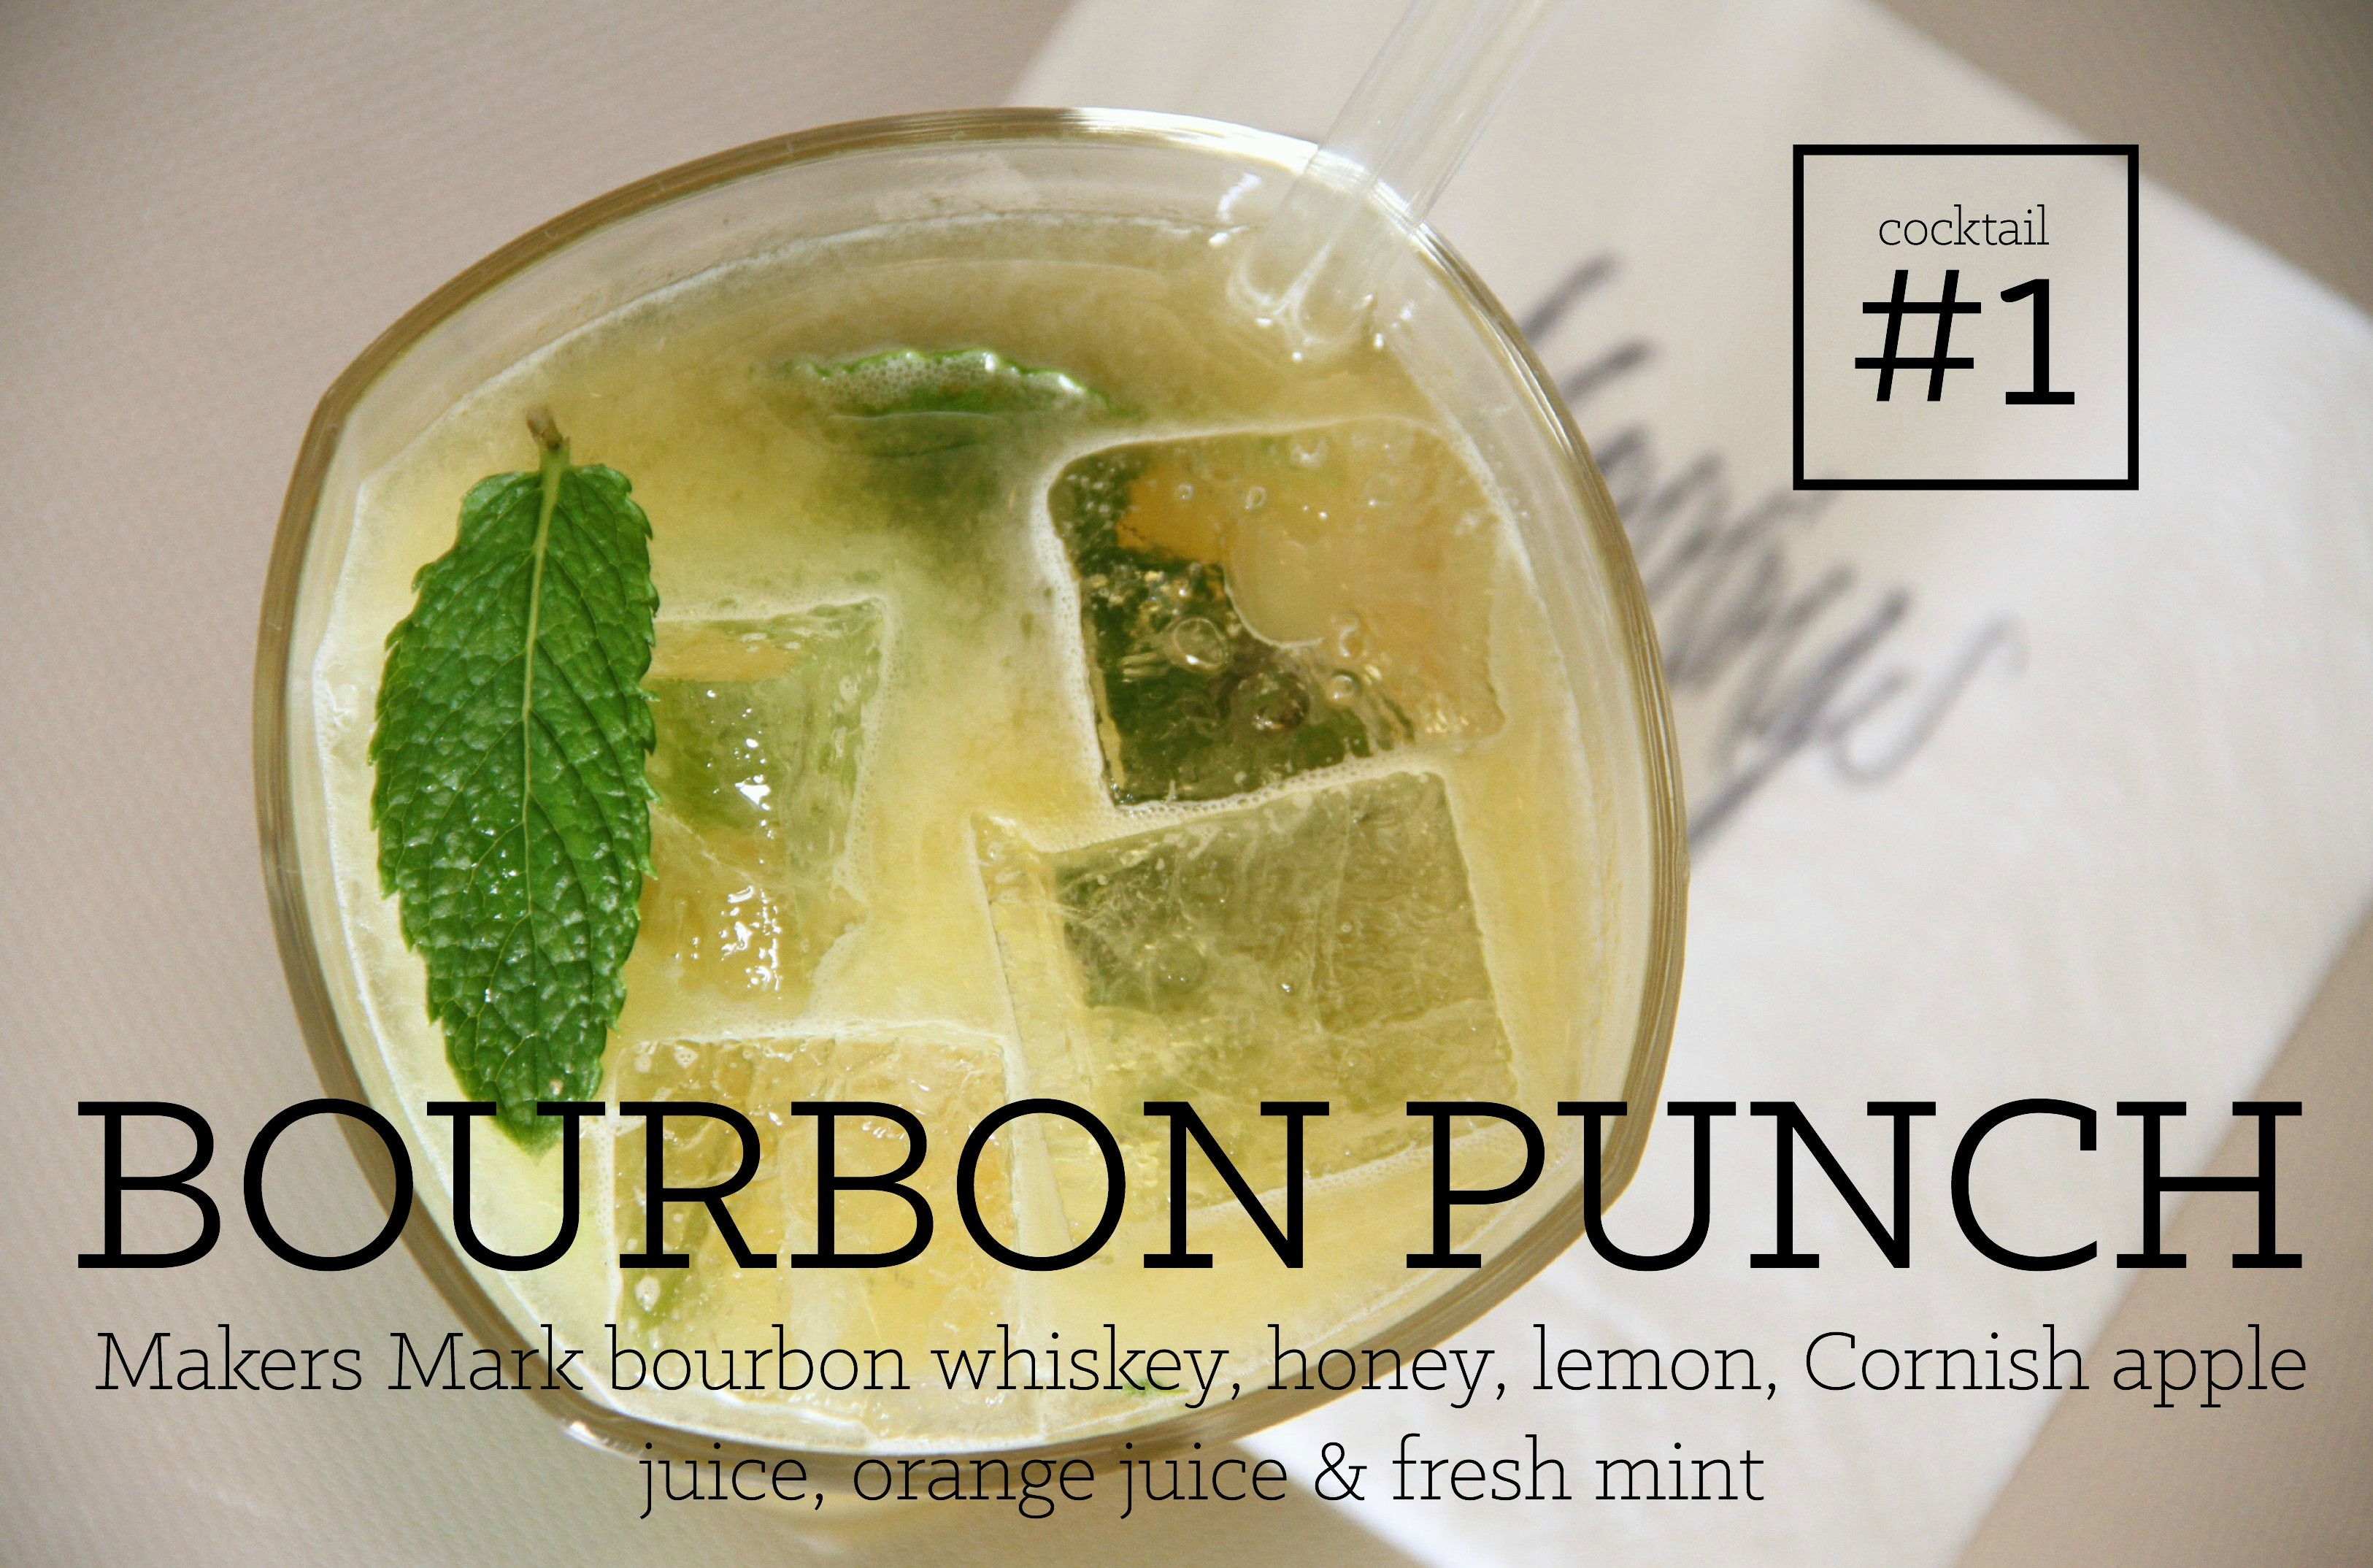 Bourbon Punch Image